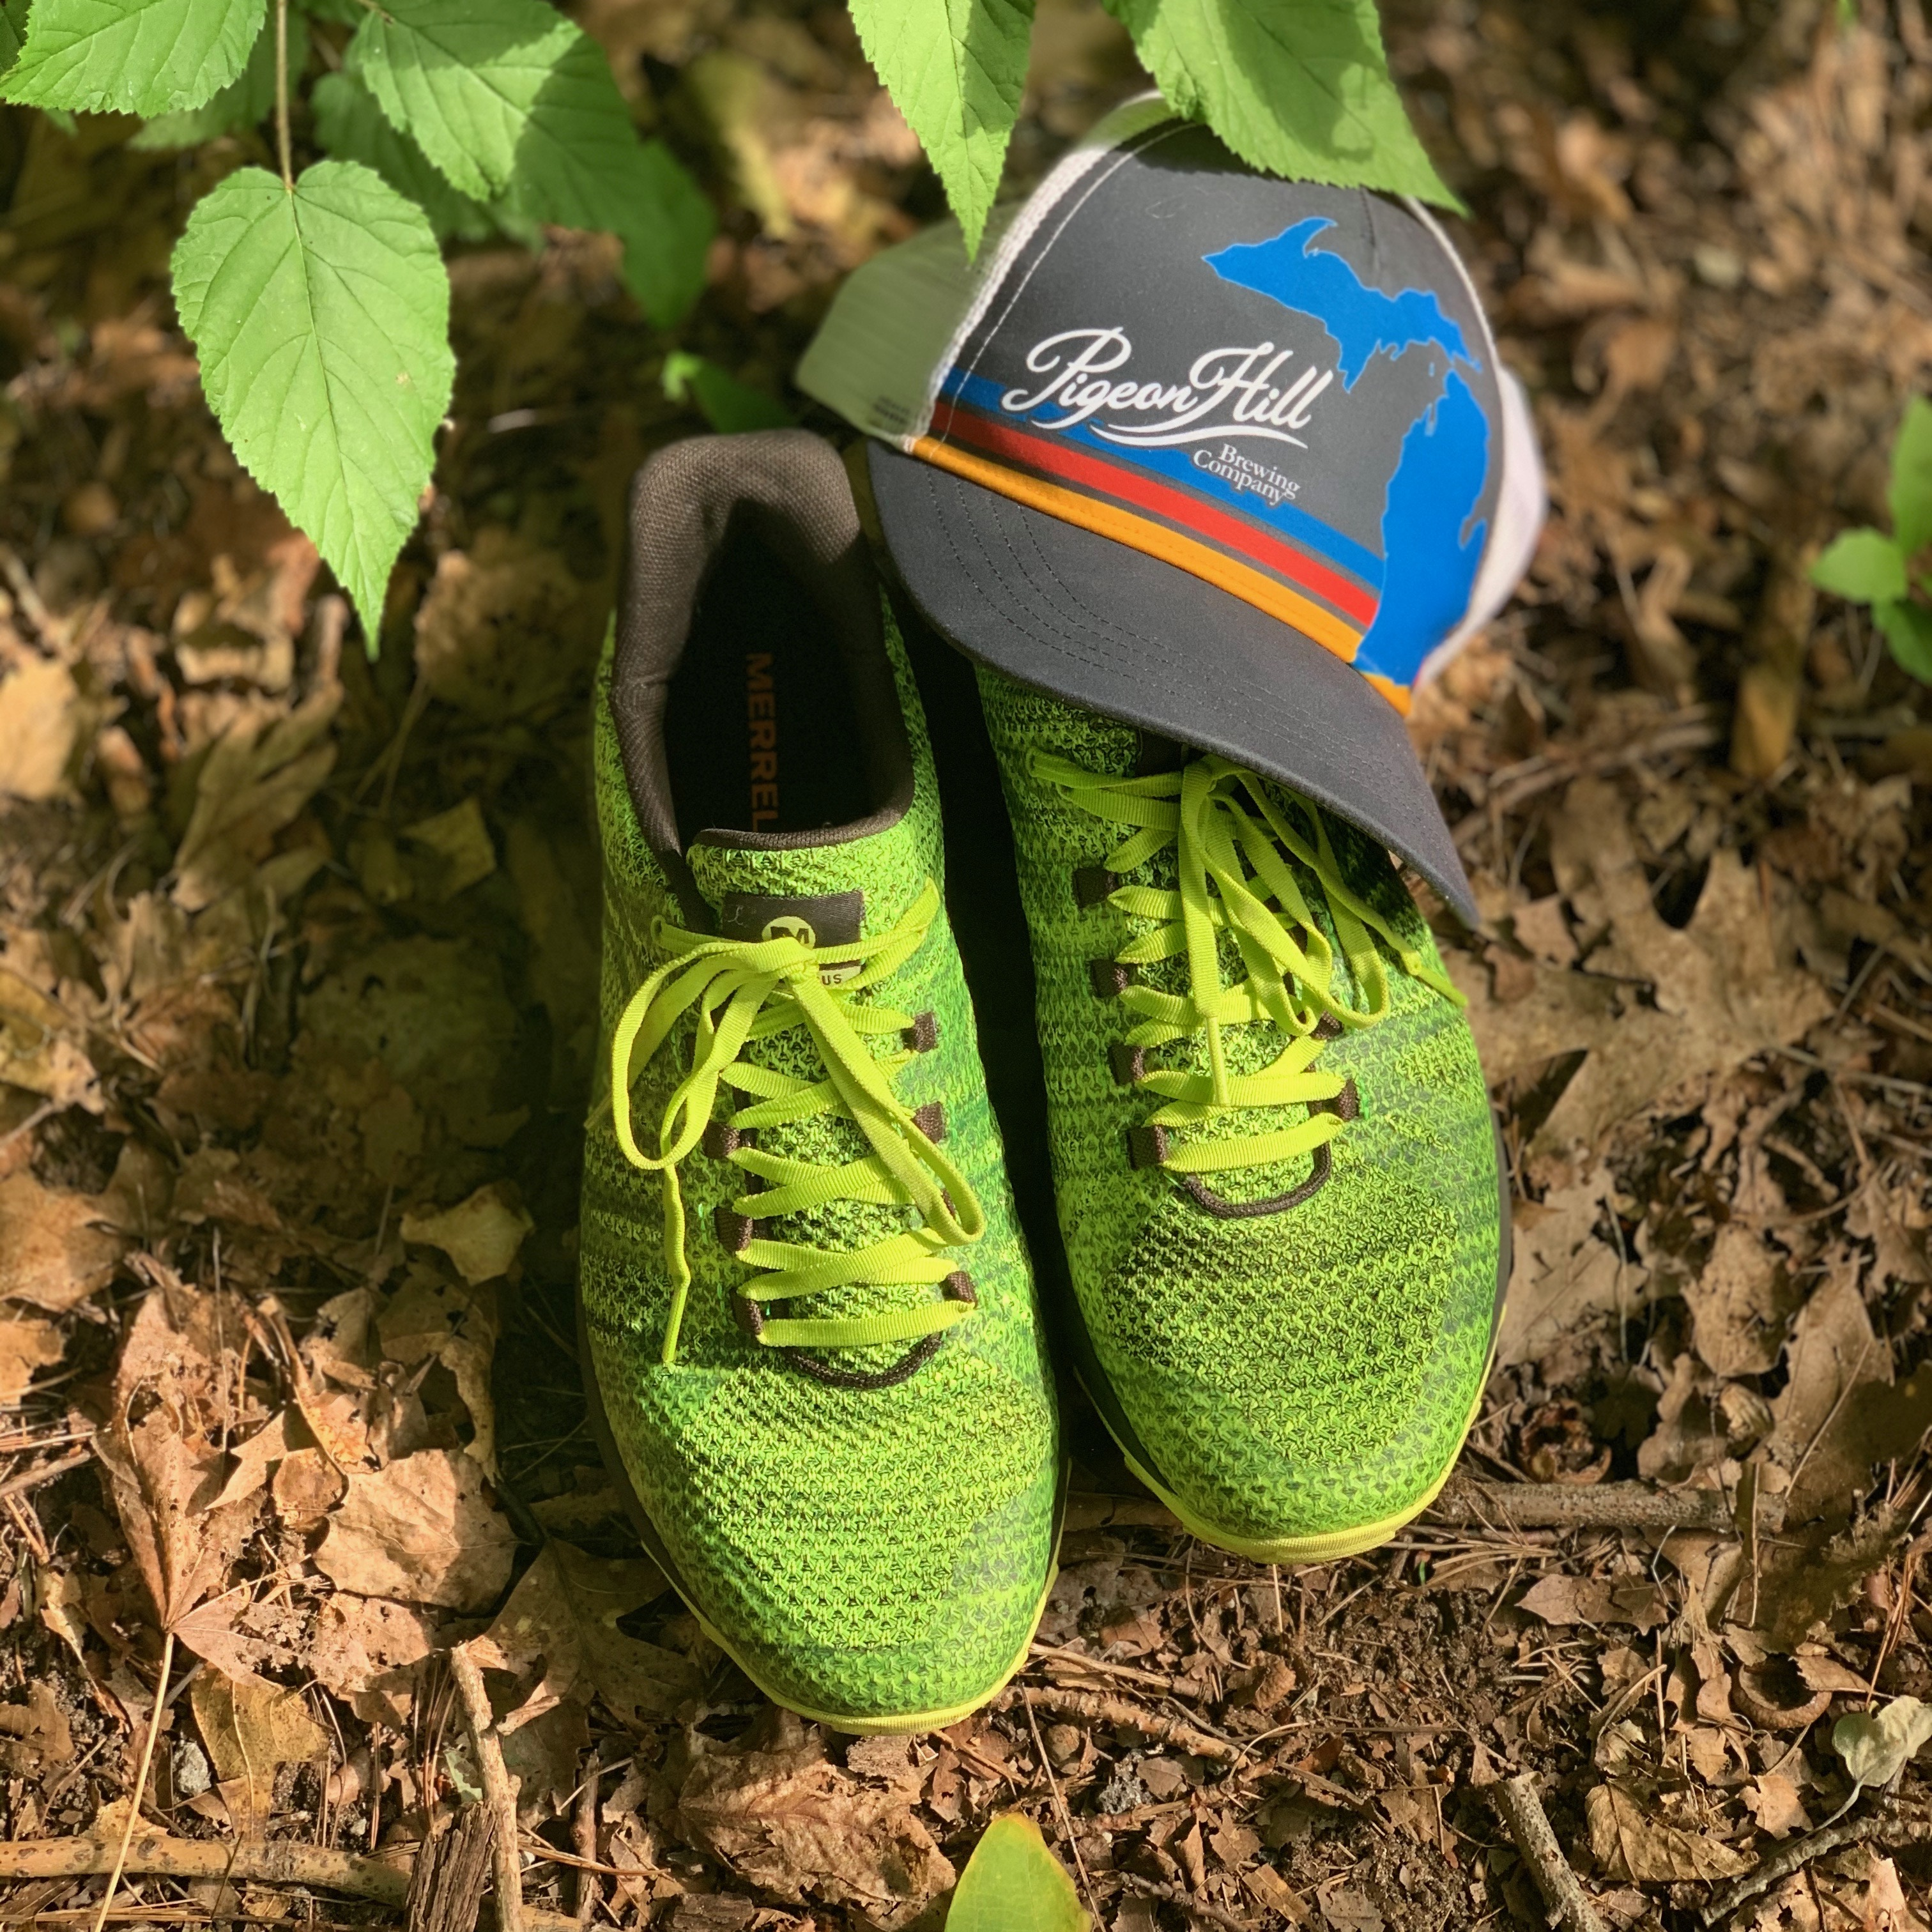 Merrell Momentous Chaussures de Trail Femme